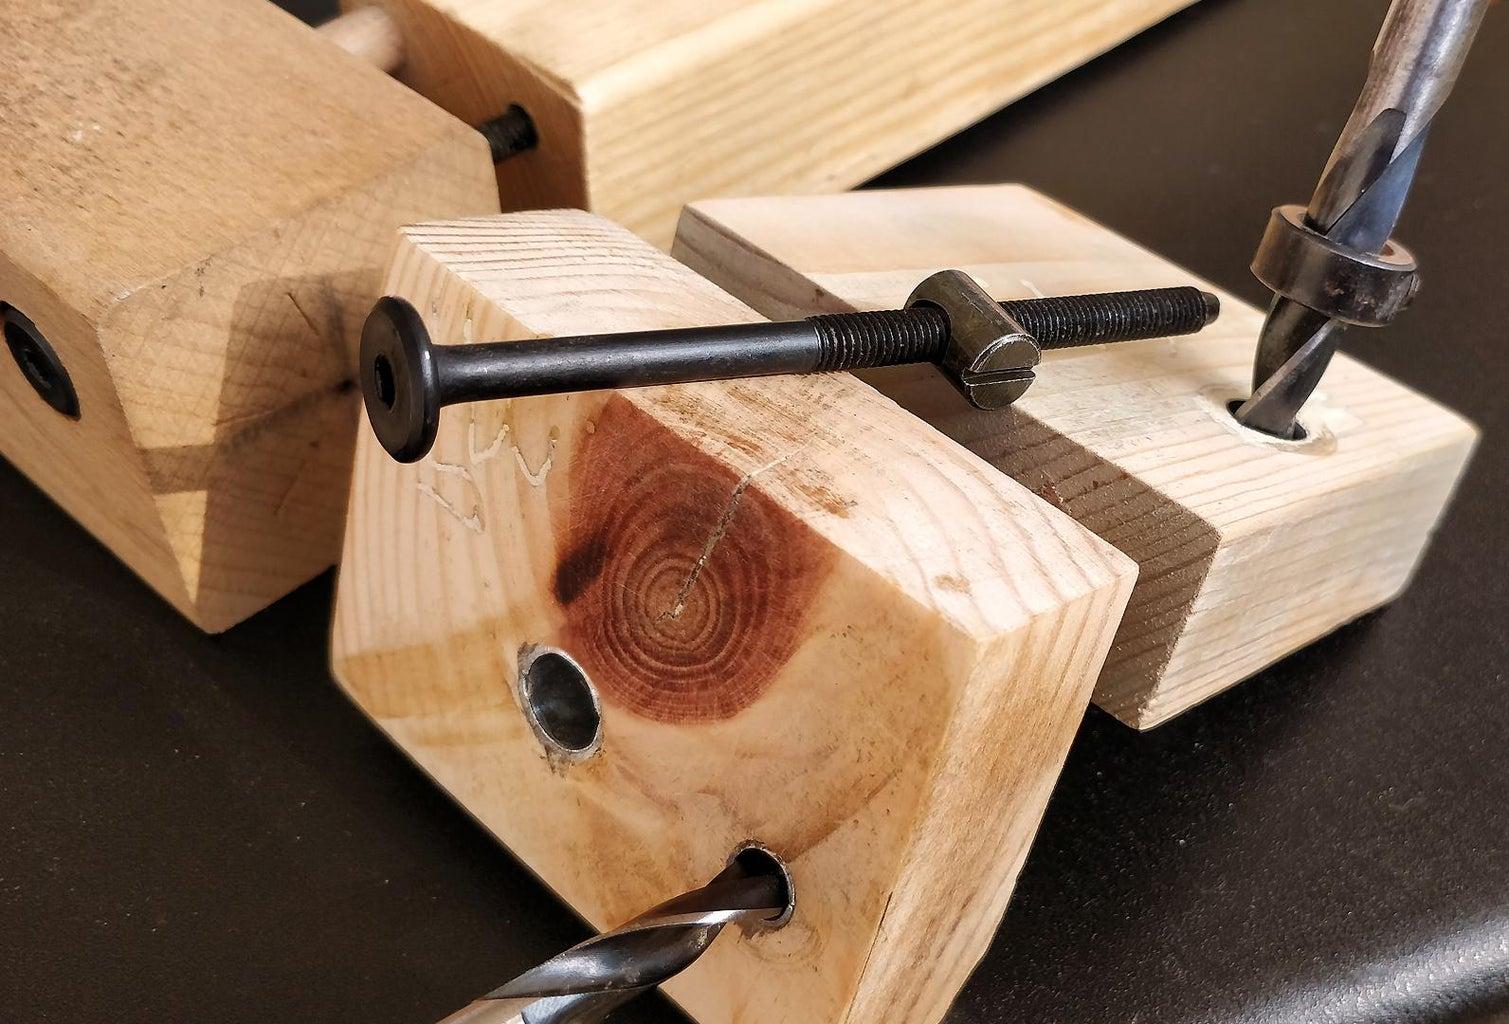 2 in 1 Cross Dowel | Barrel Nut Jig for Detachable Wooden Furniture Joints DIY